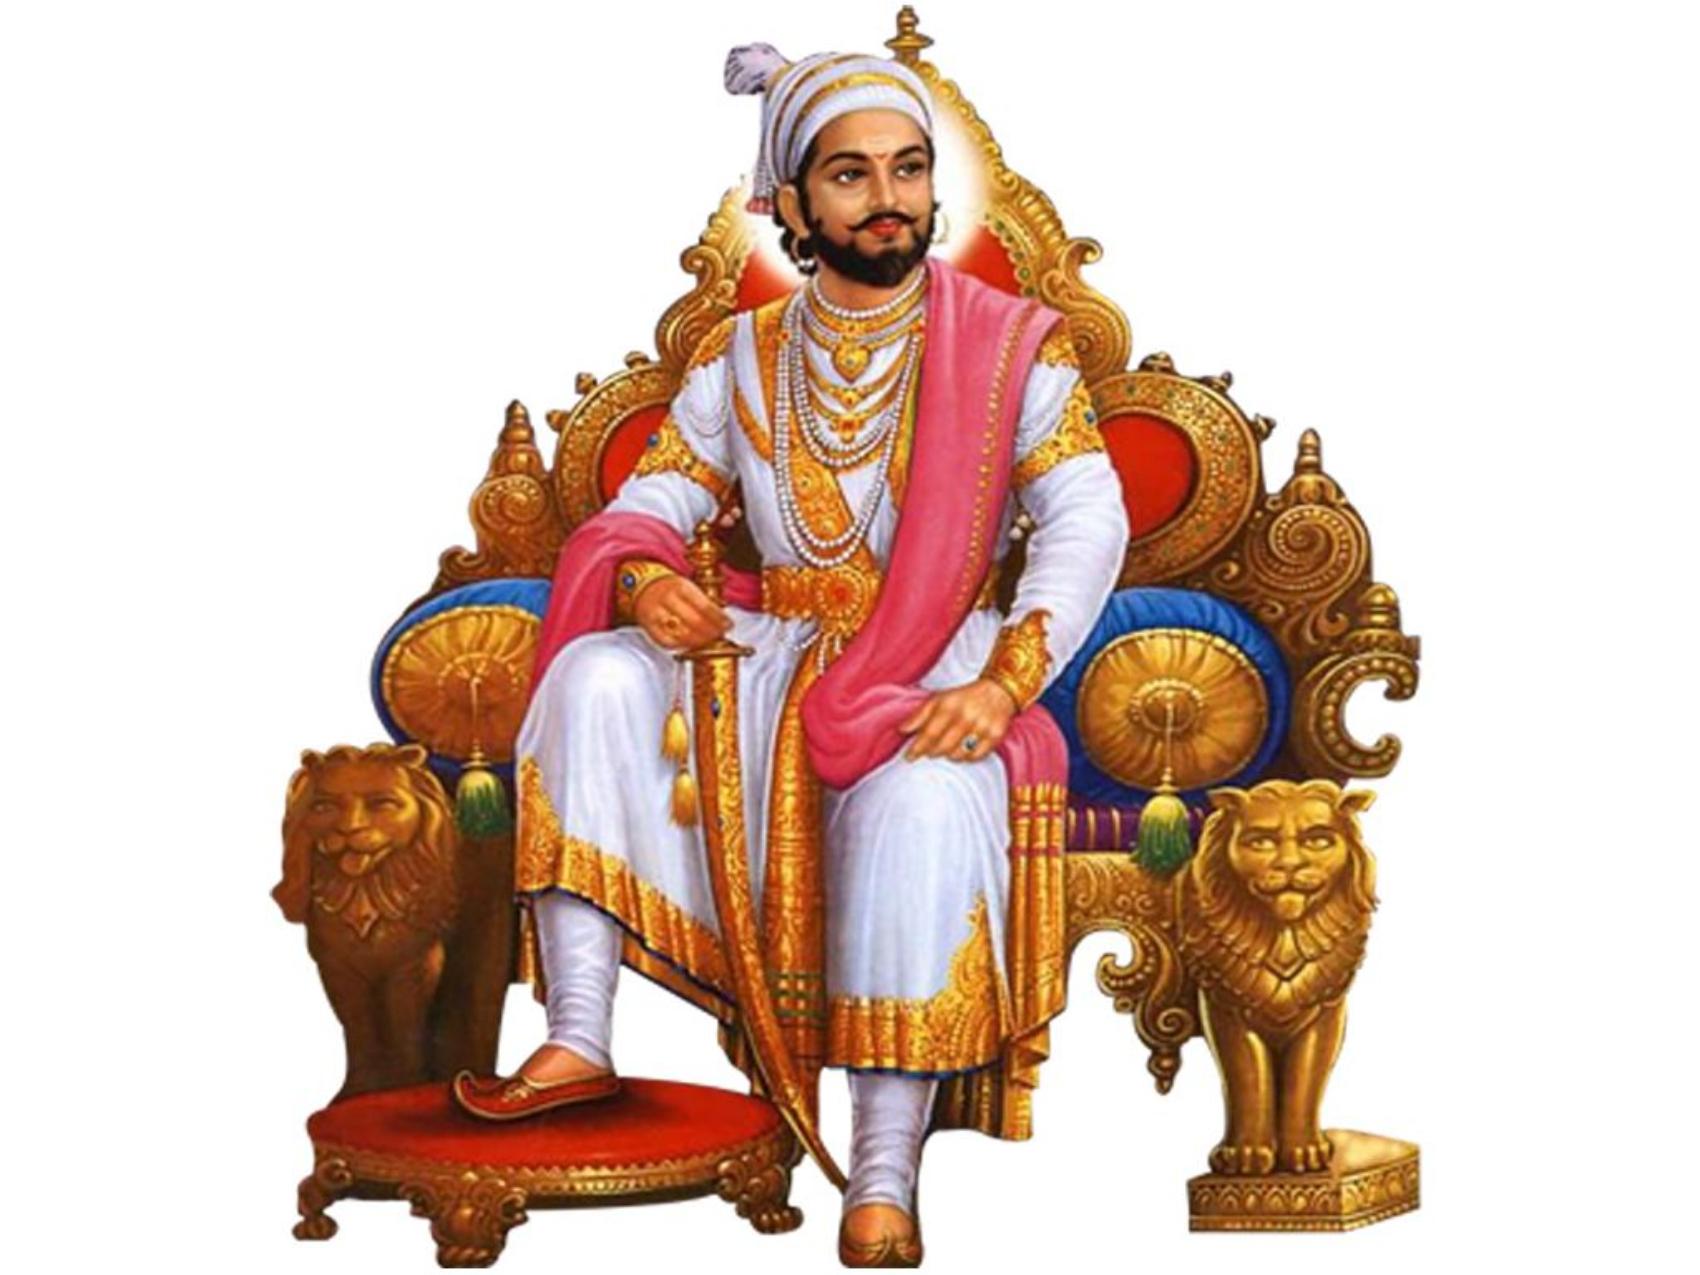 Goal of Chhatrapati Shivaji Maharaj's life was to create Hindu ...